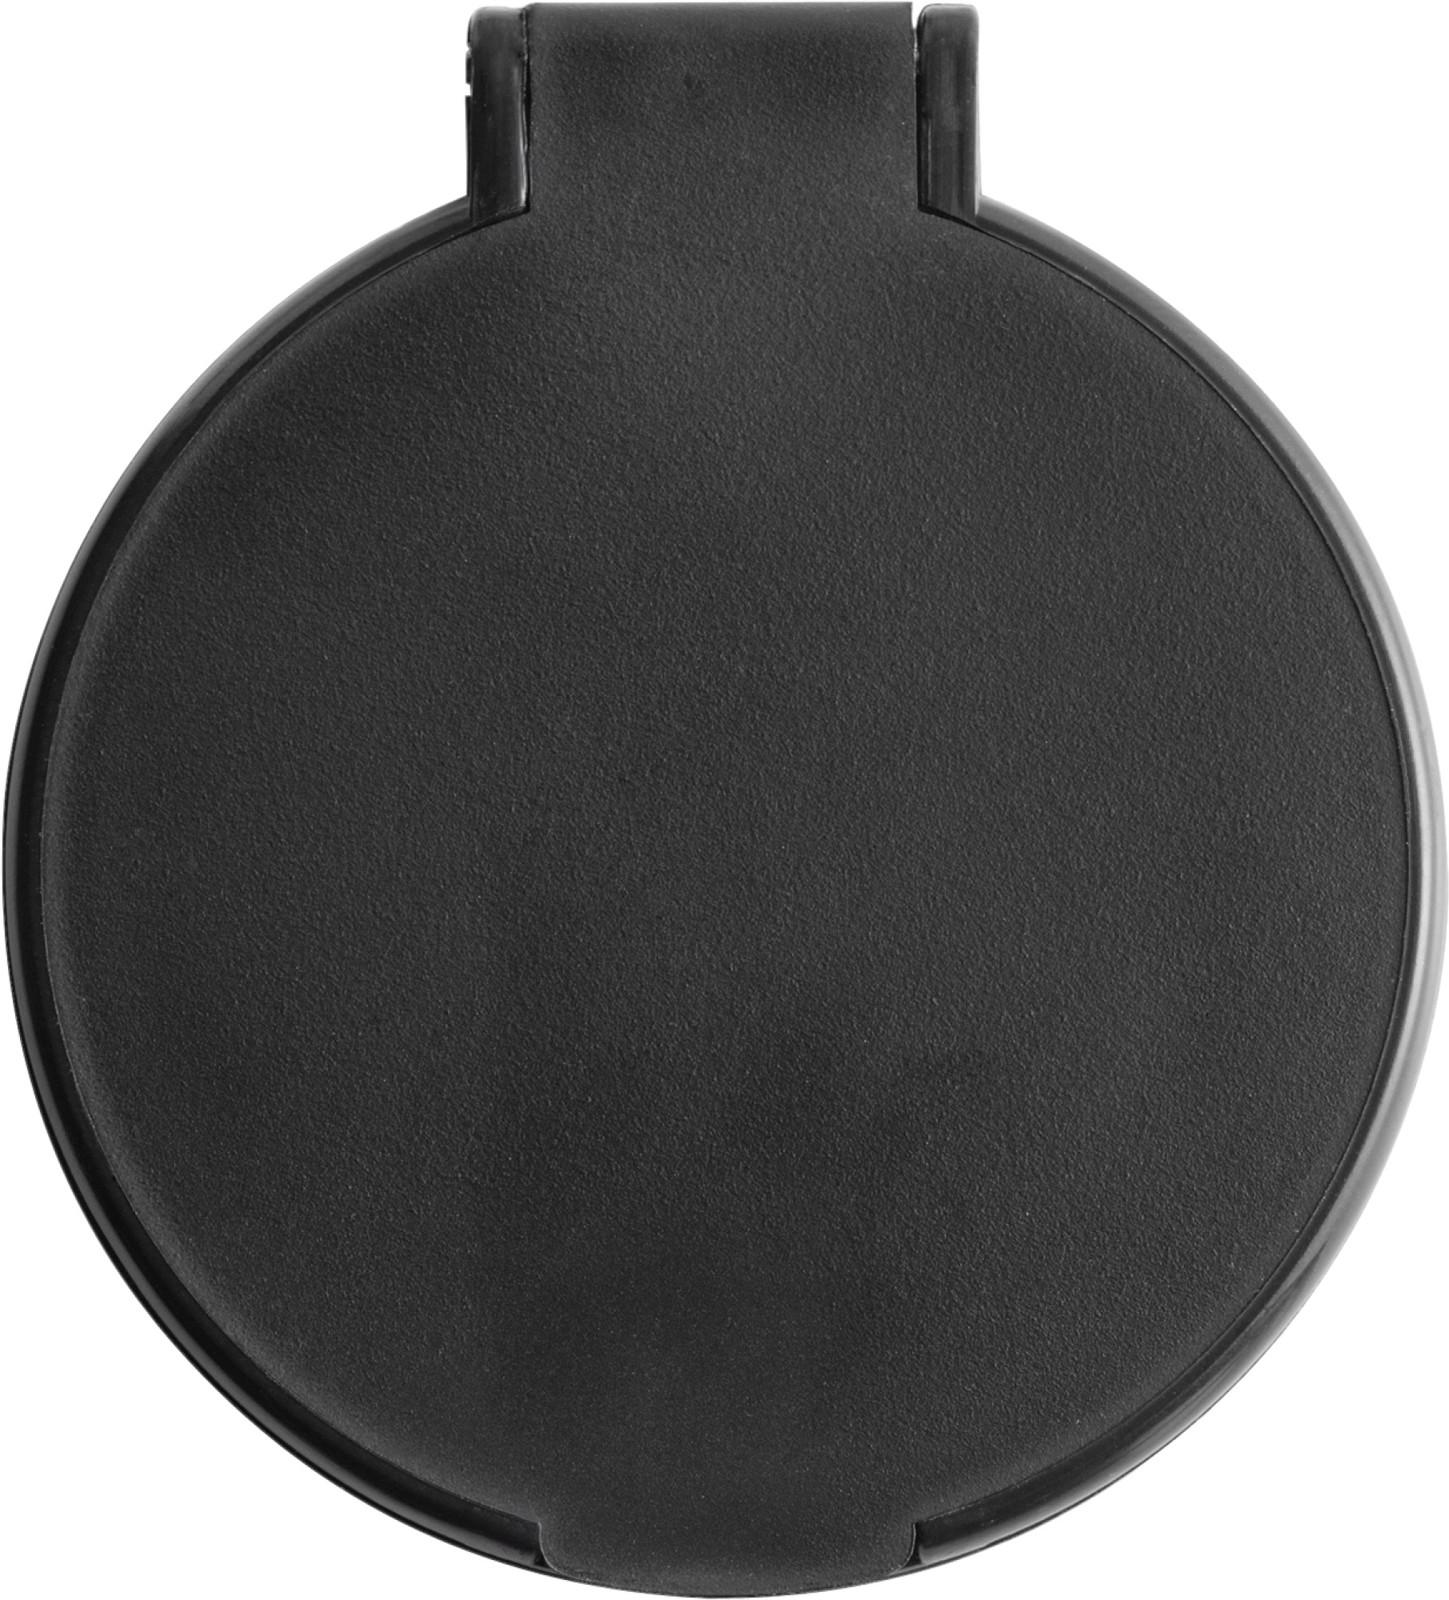 PS pocket mirror - Black